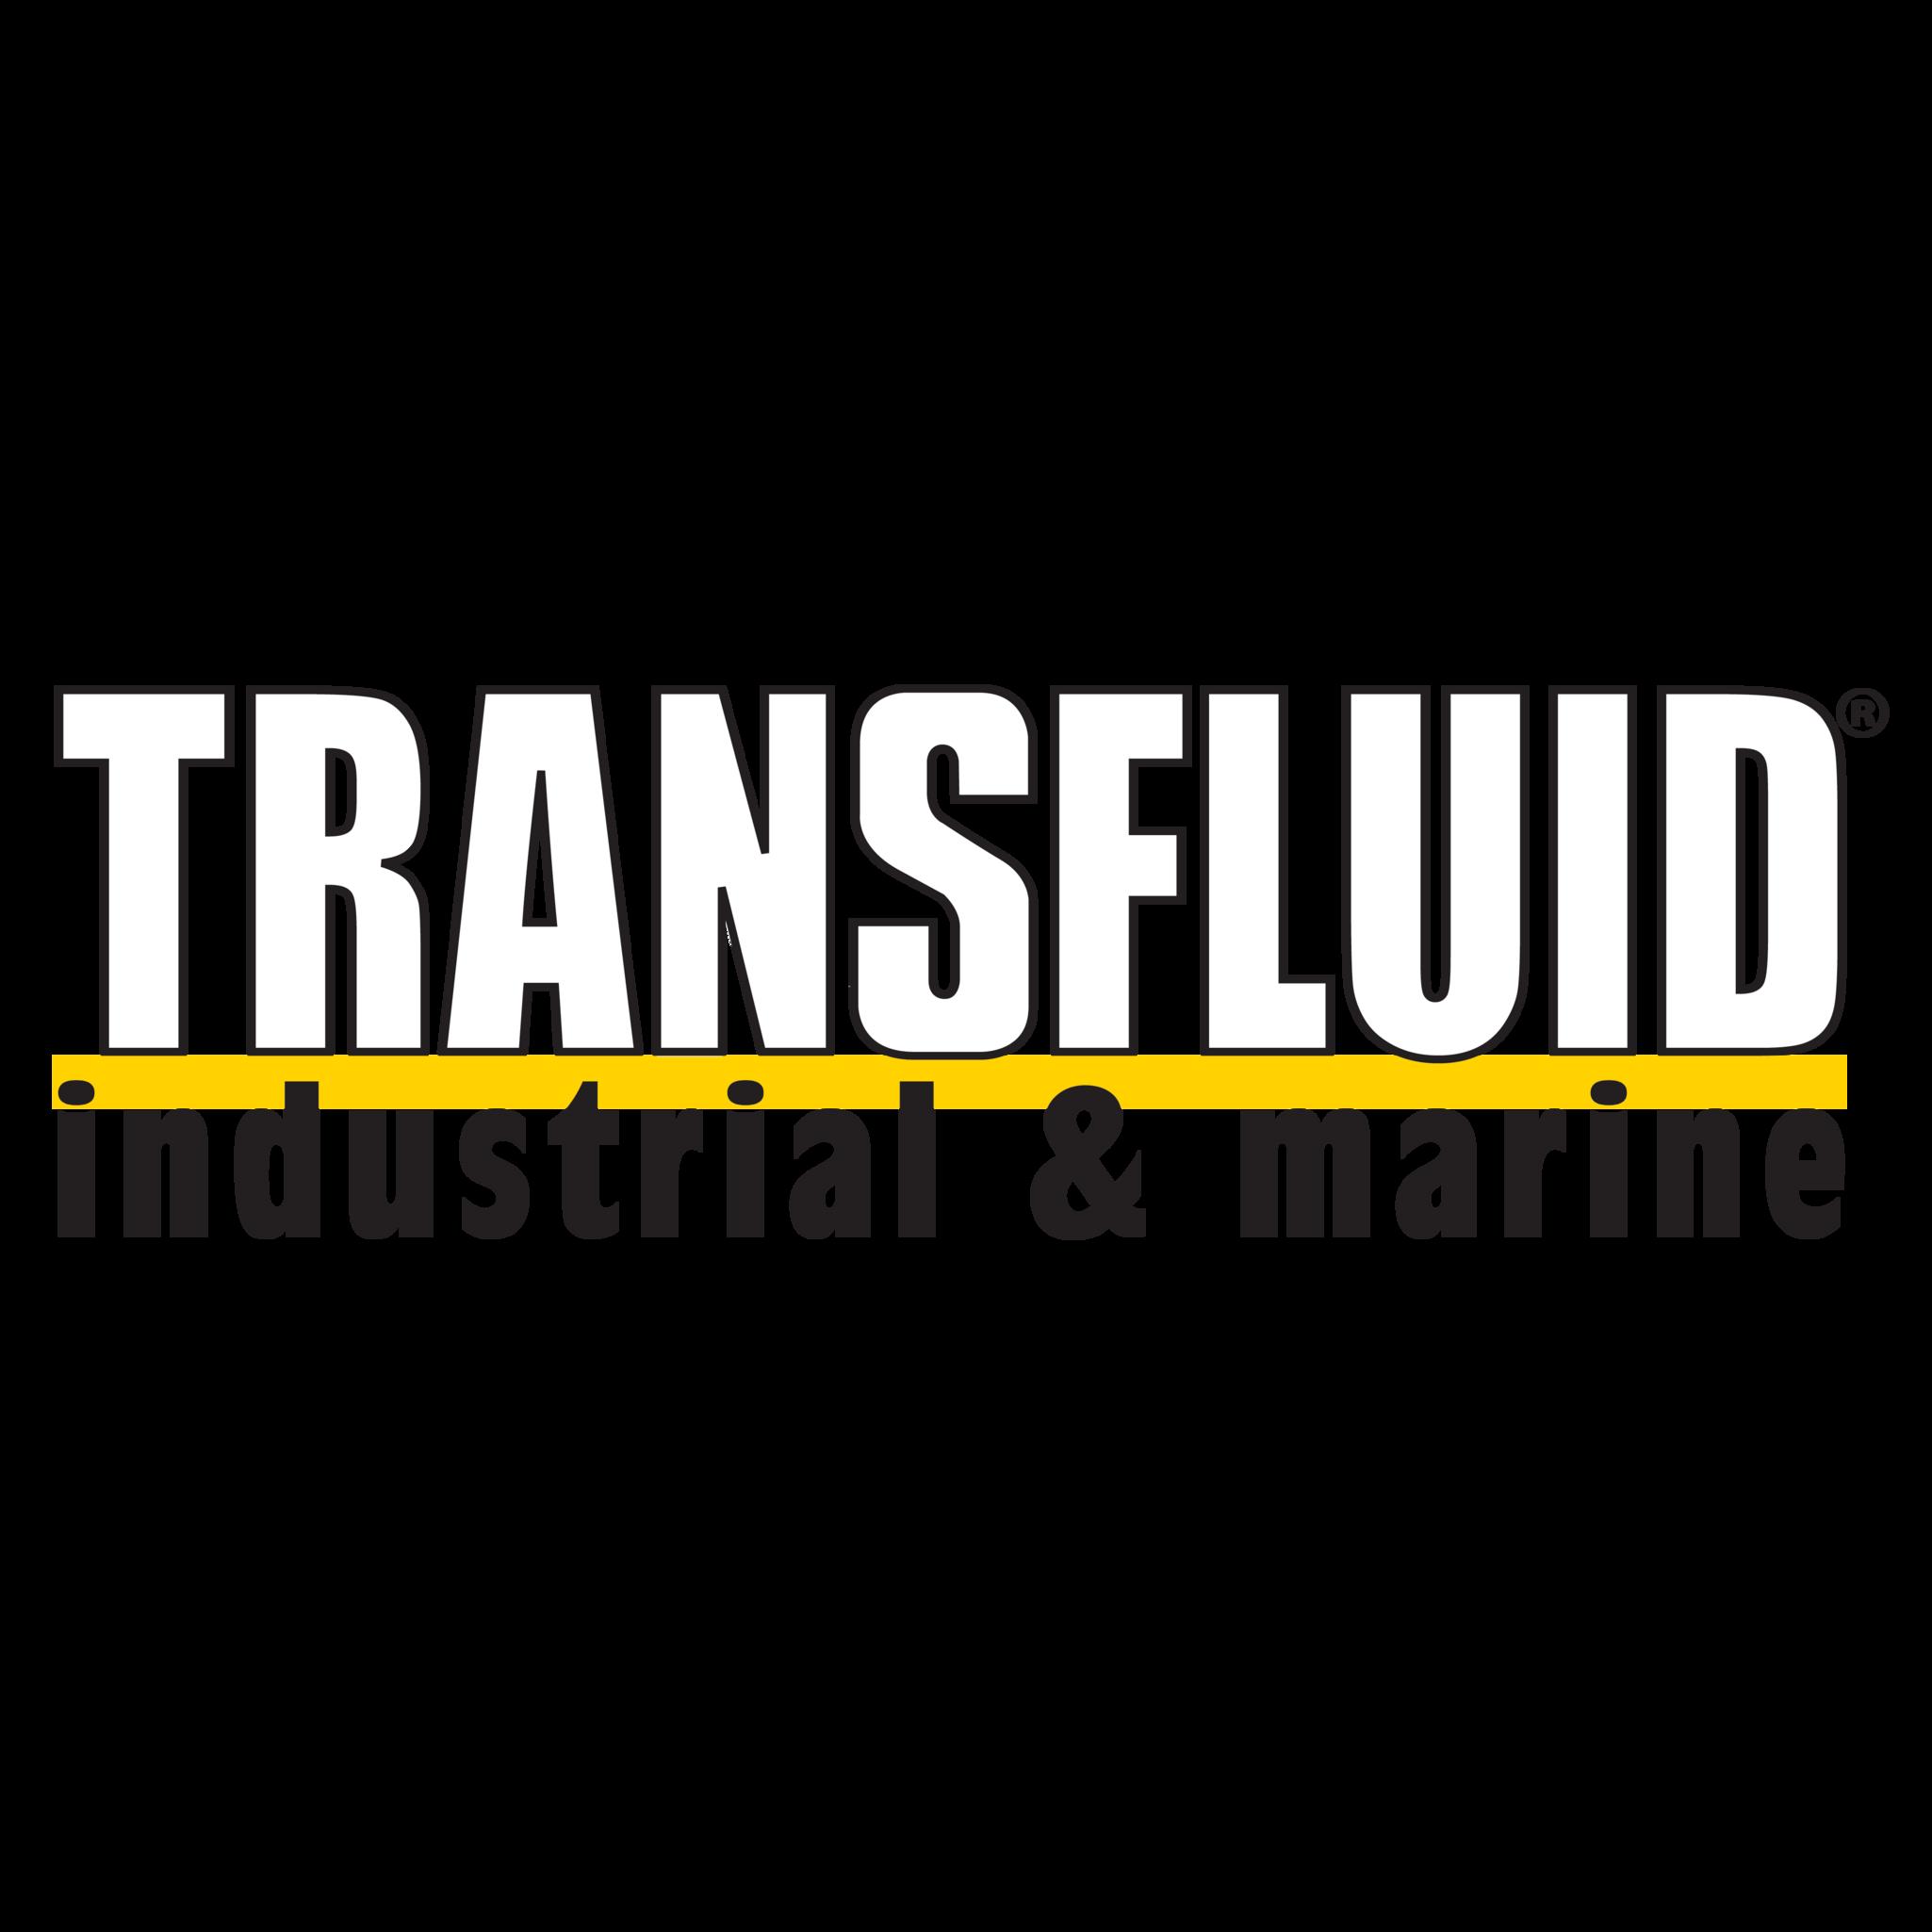 Company logo of Transfluid S.p.A.